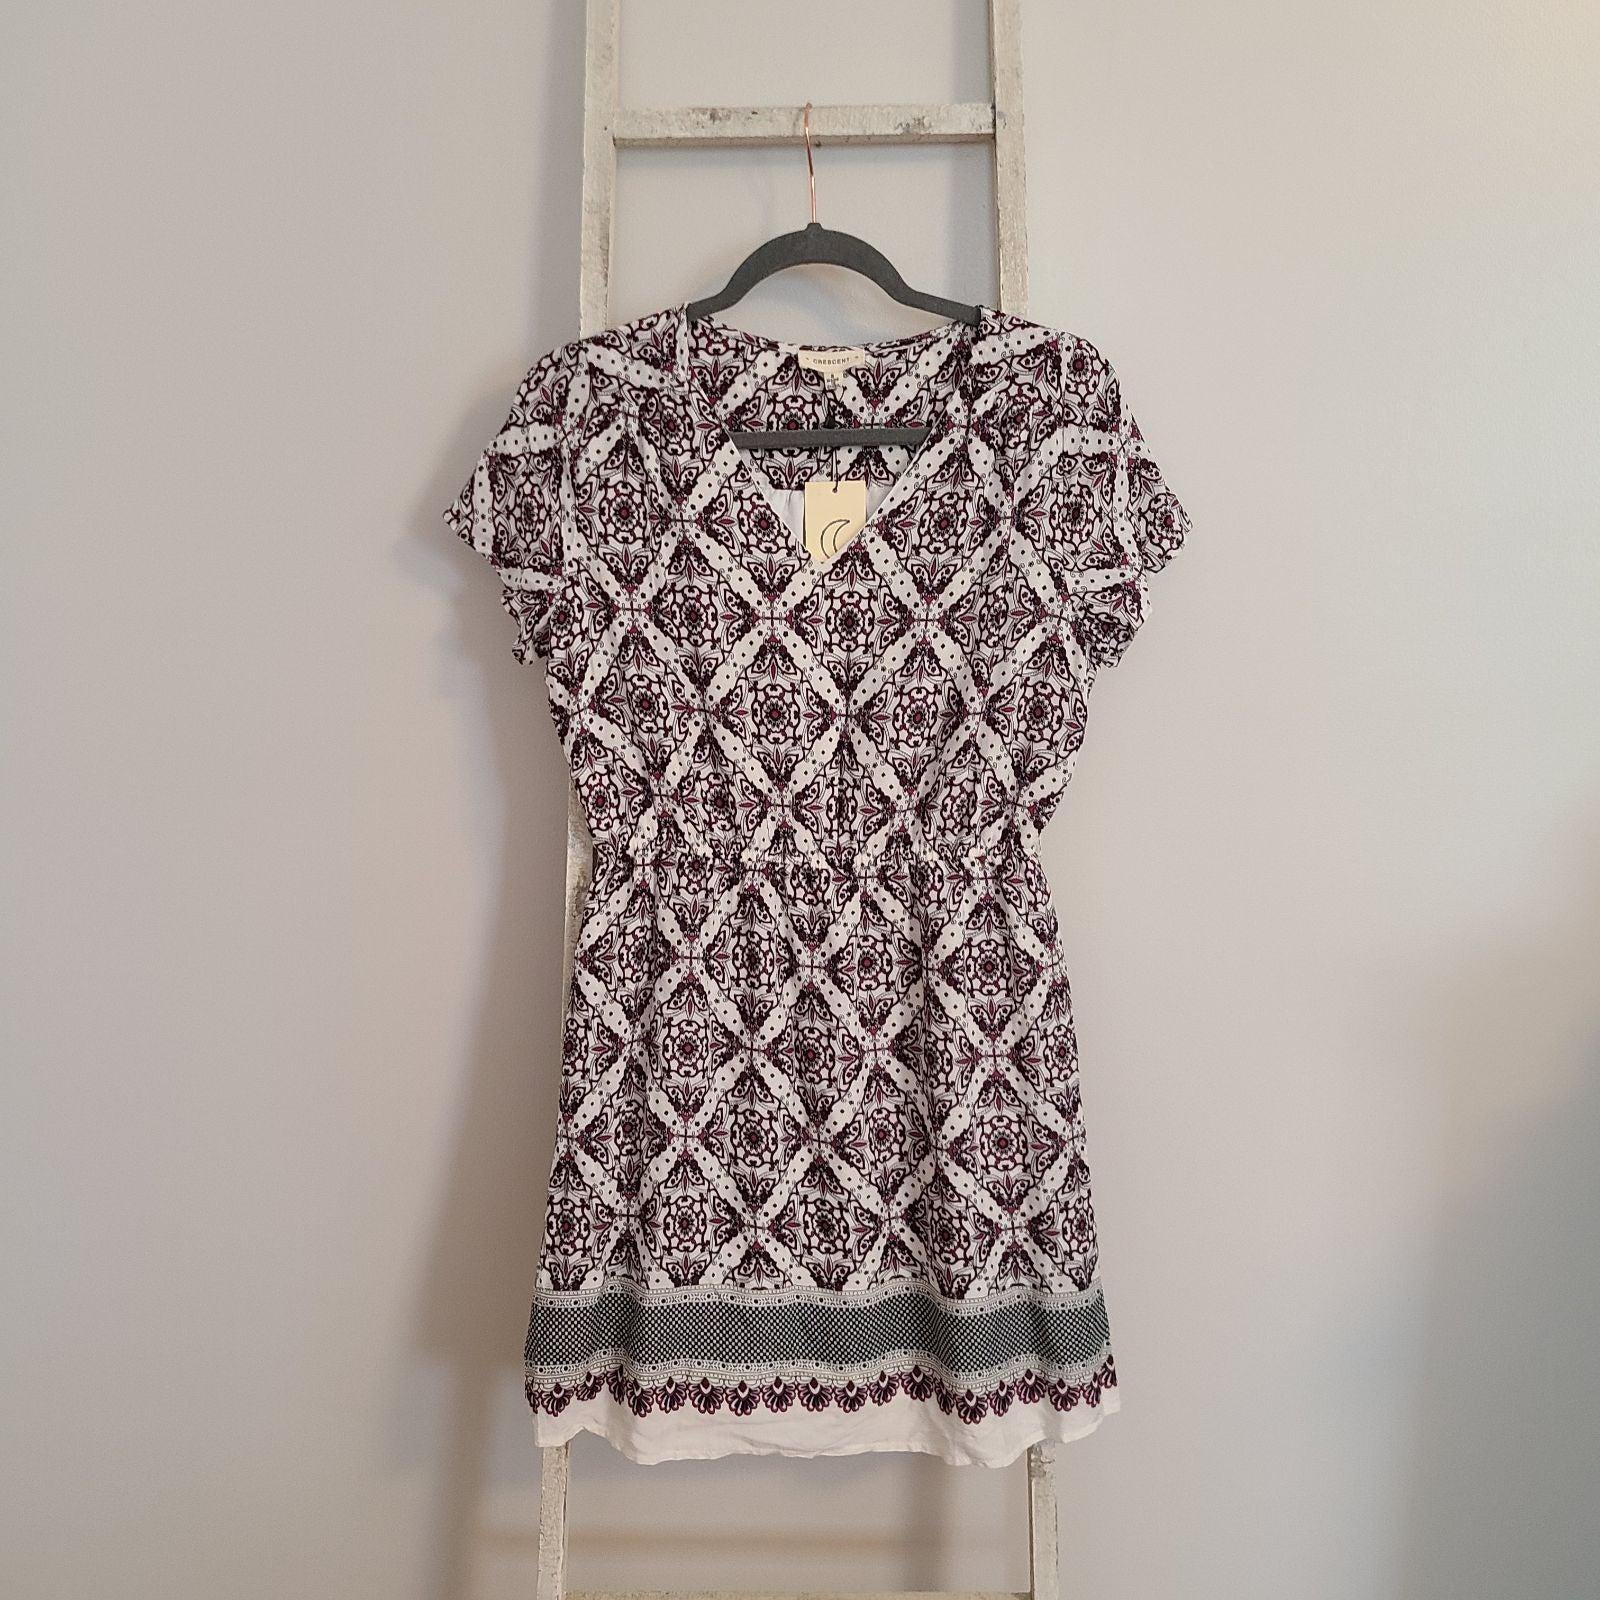 Crescent stitch fix V-neck dress